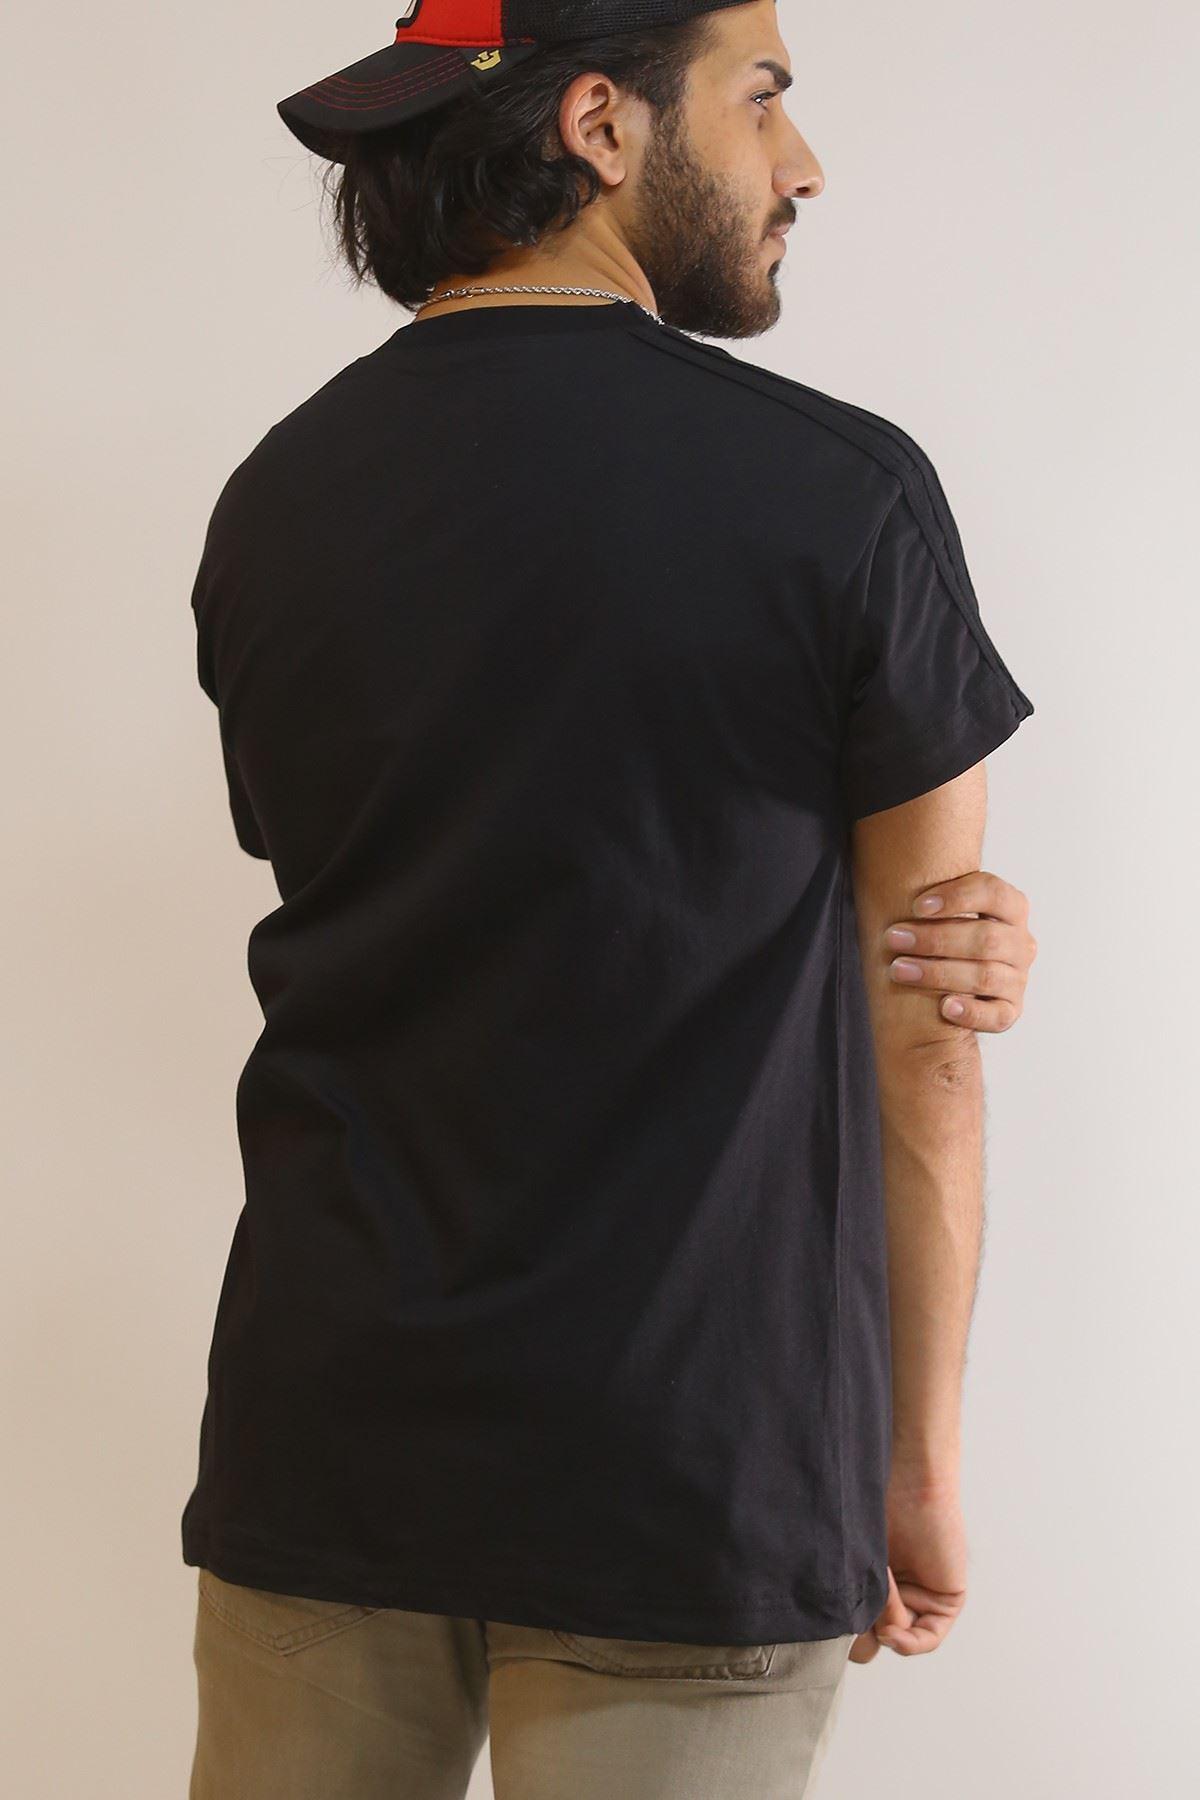 Nakışlı Tişört Siyah - 5970.1377.